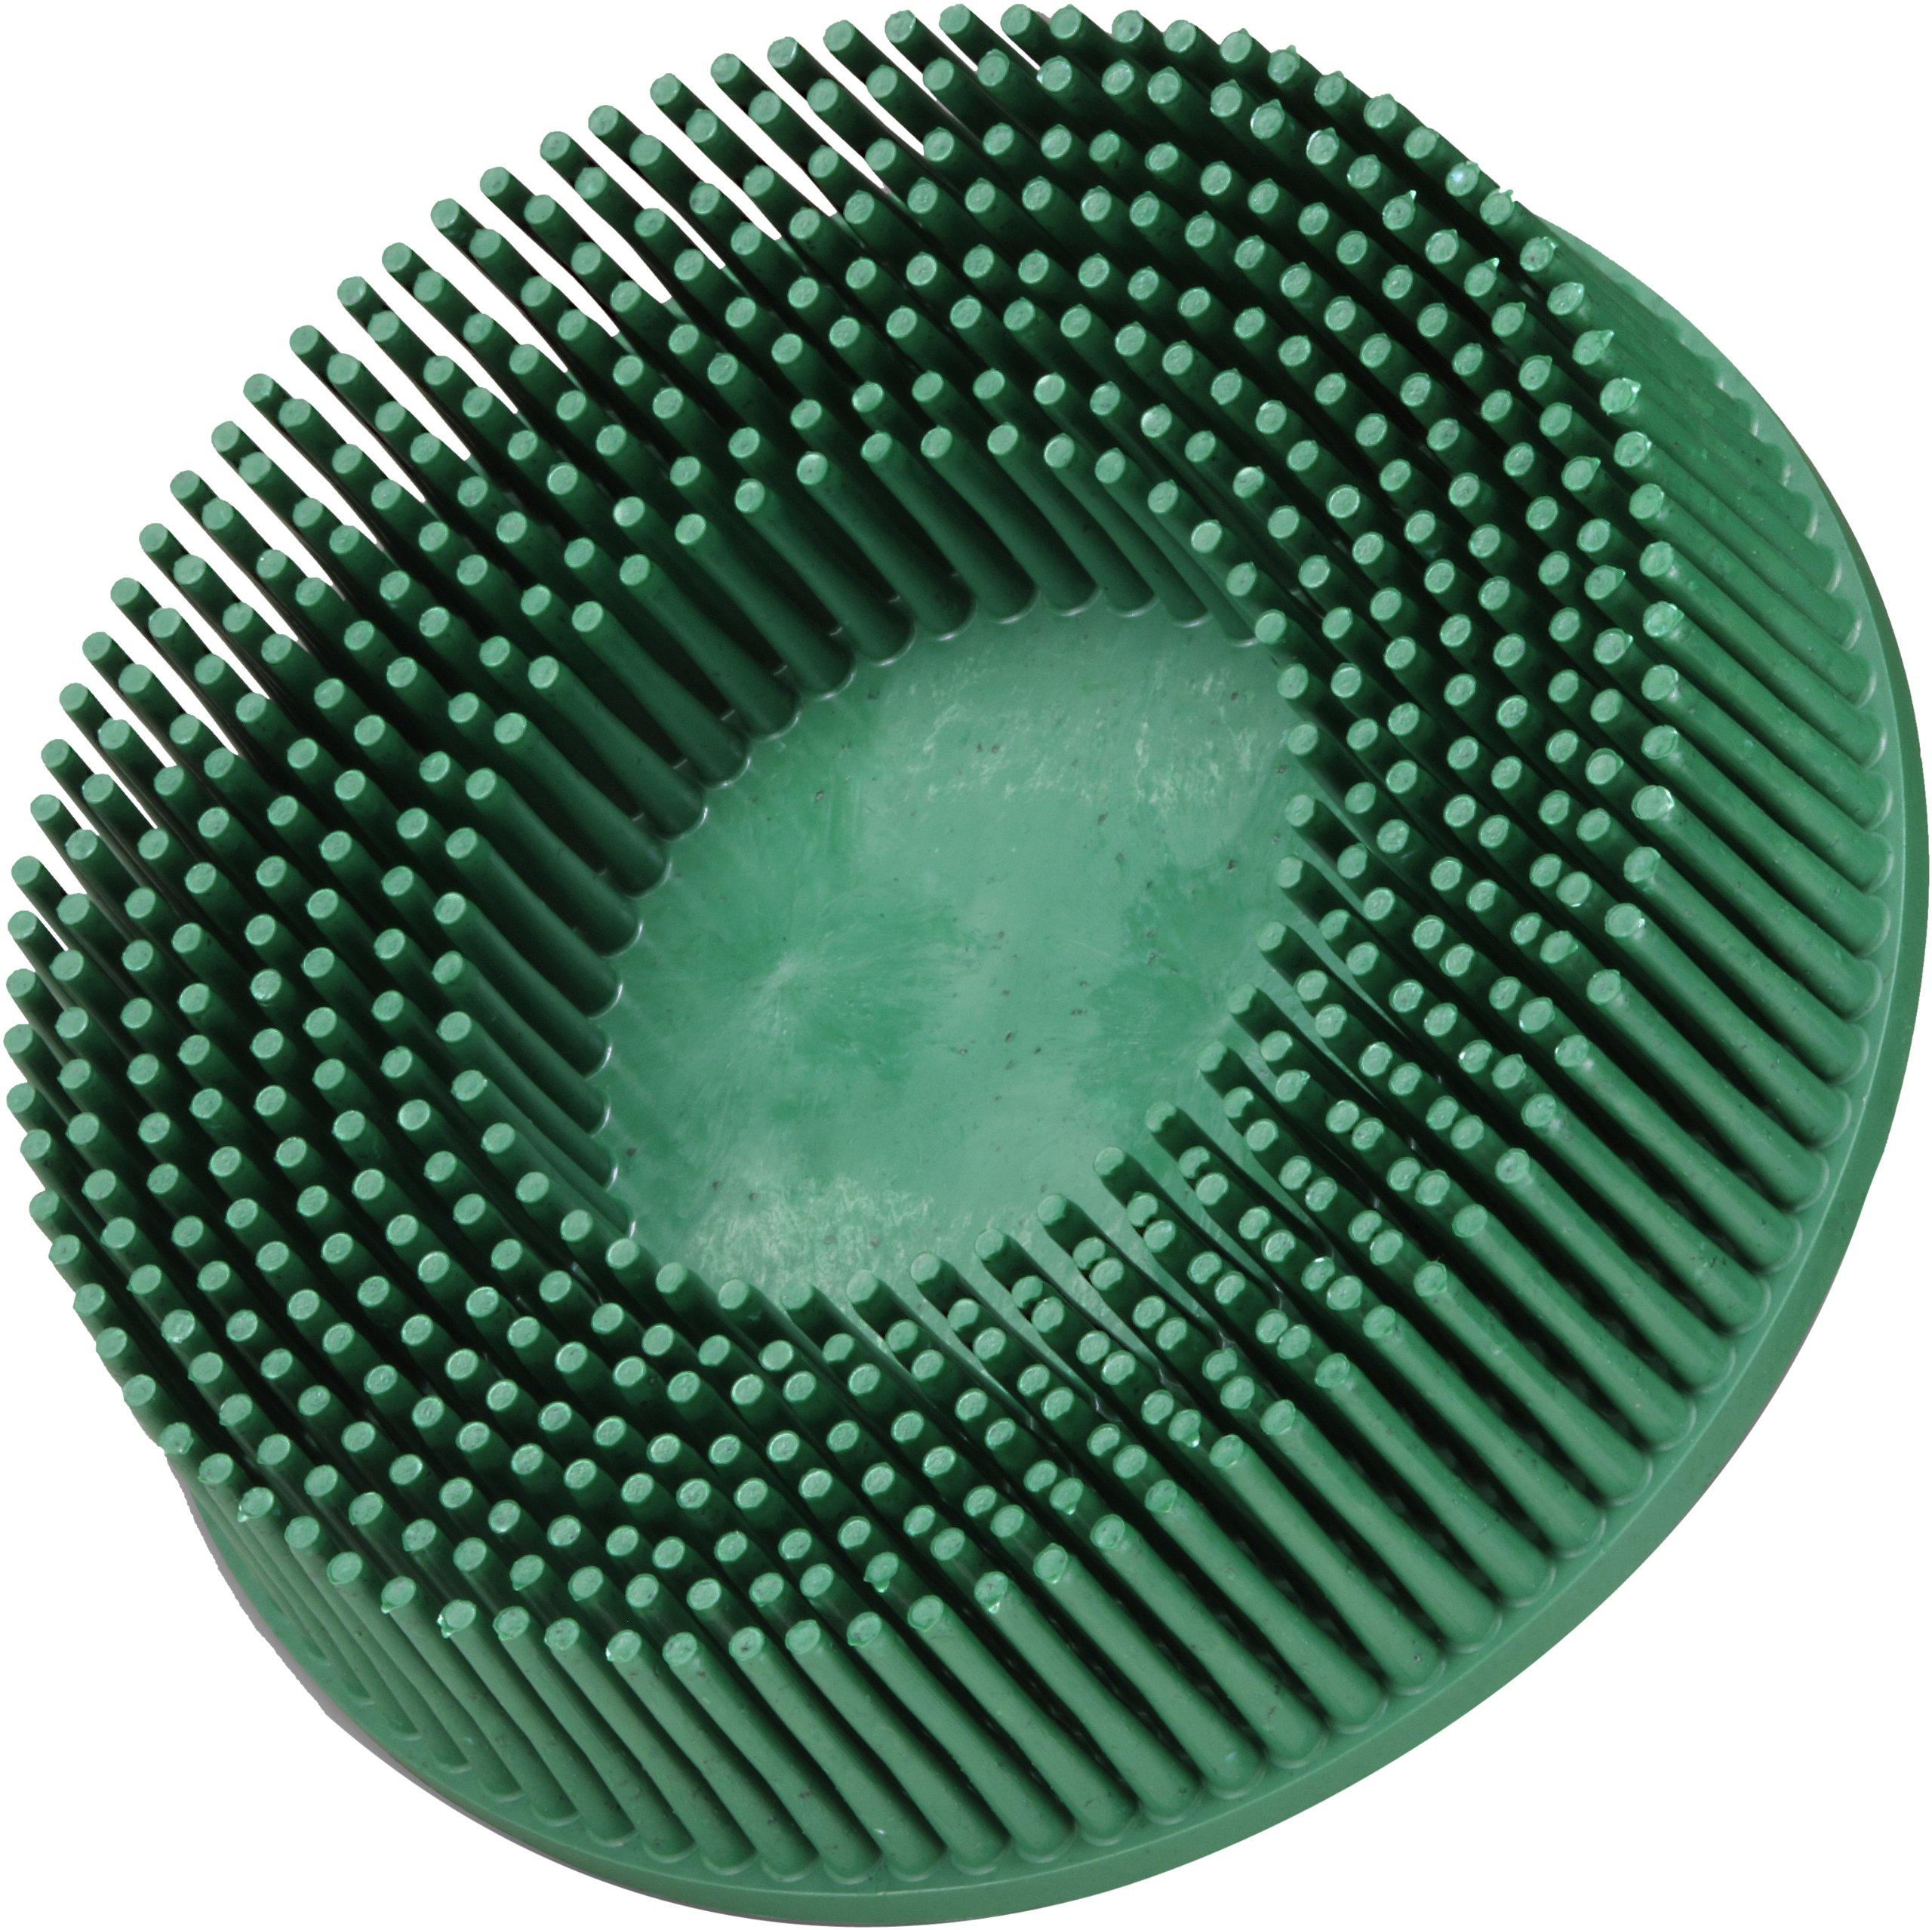 Scotch-Brite(TM) Roloc(TM) Bristle Disc, Ceramic, 15000 rpm, 3 Diameter, 50 Grit, Green (Pack of 10)